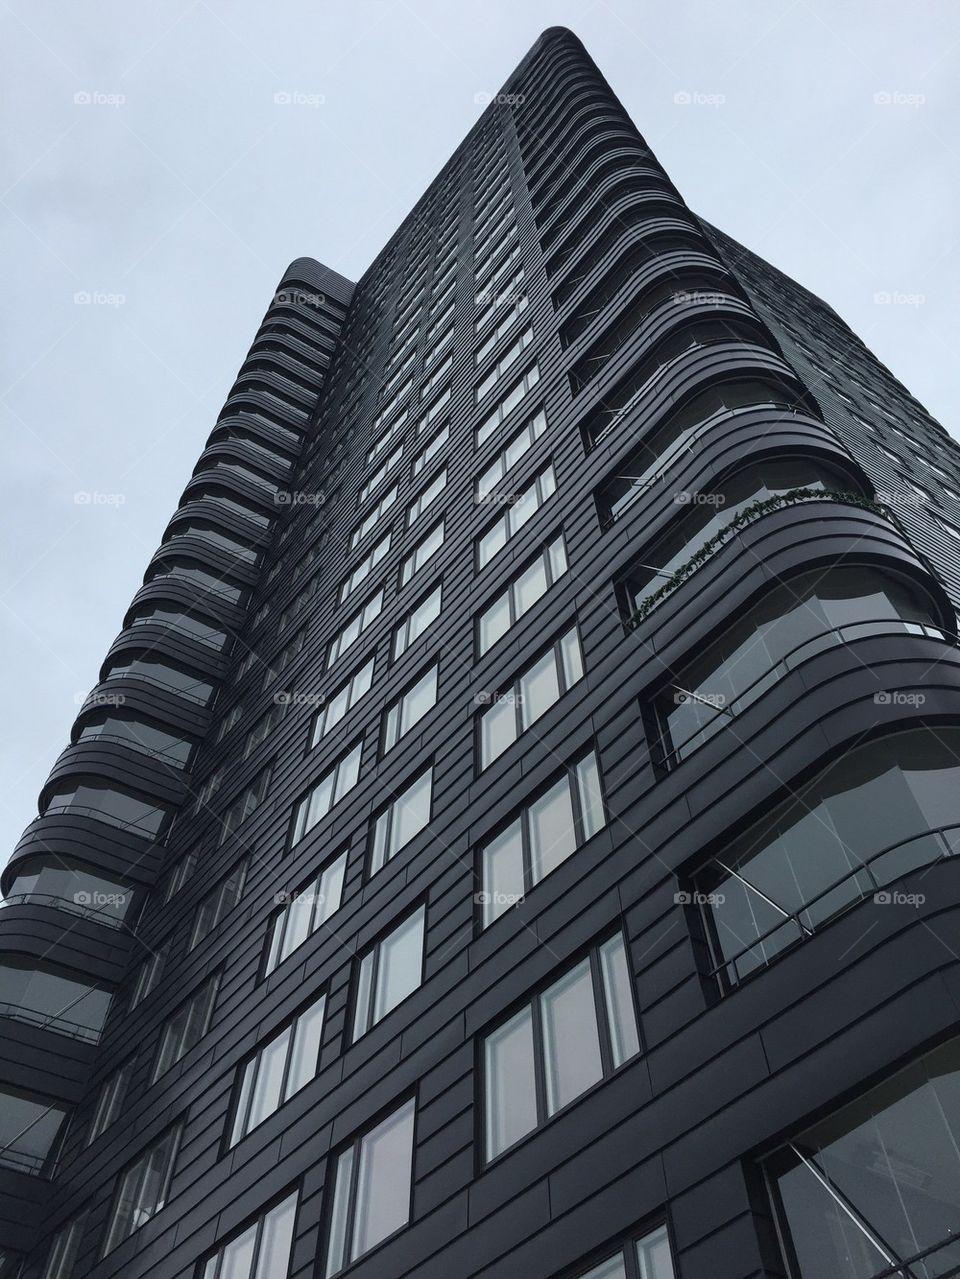 Black towers